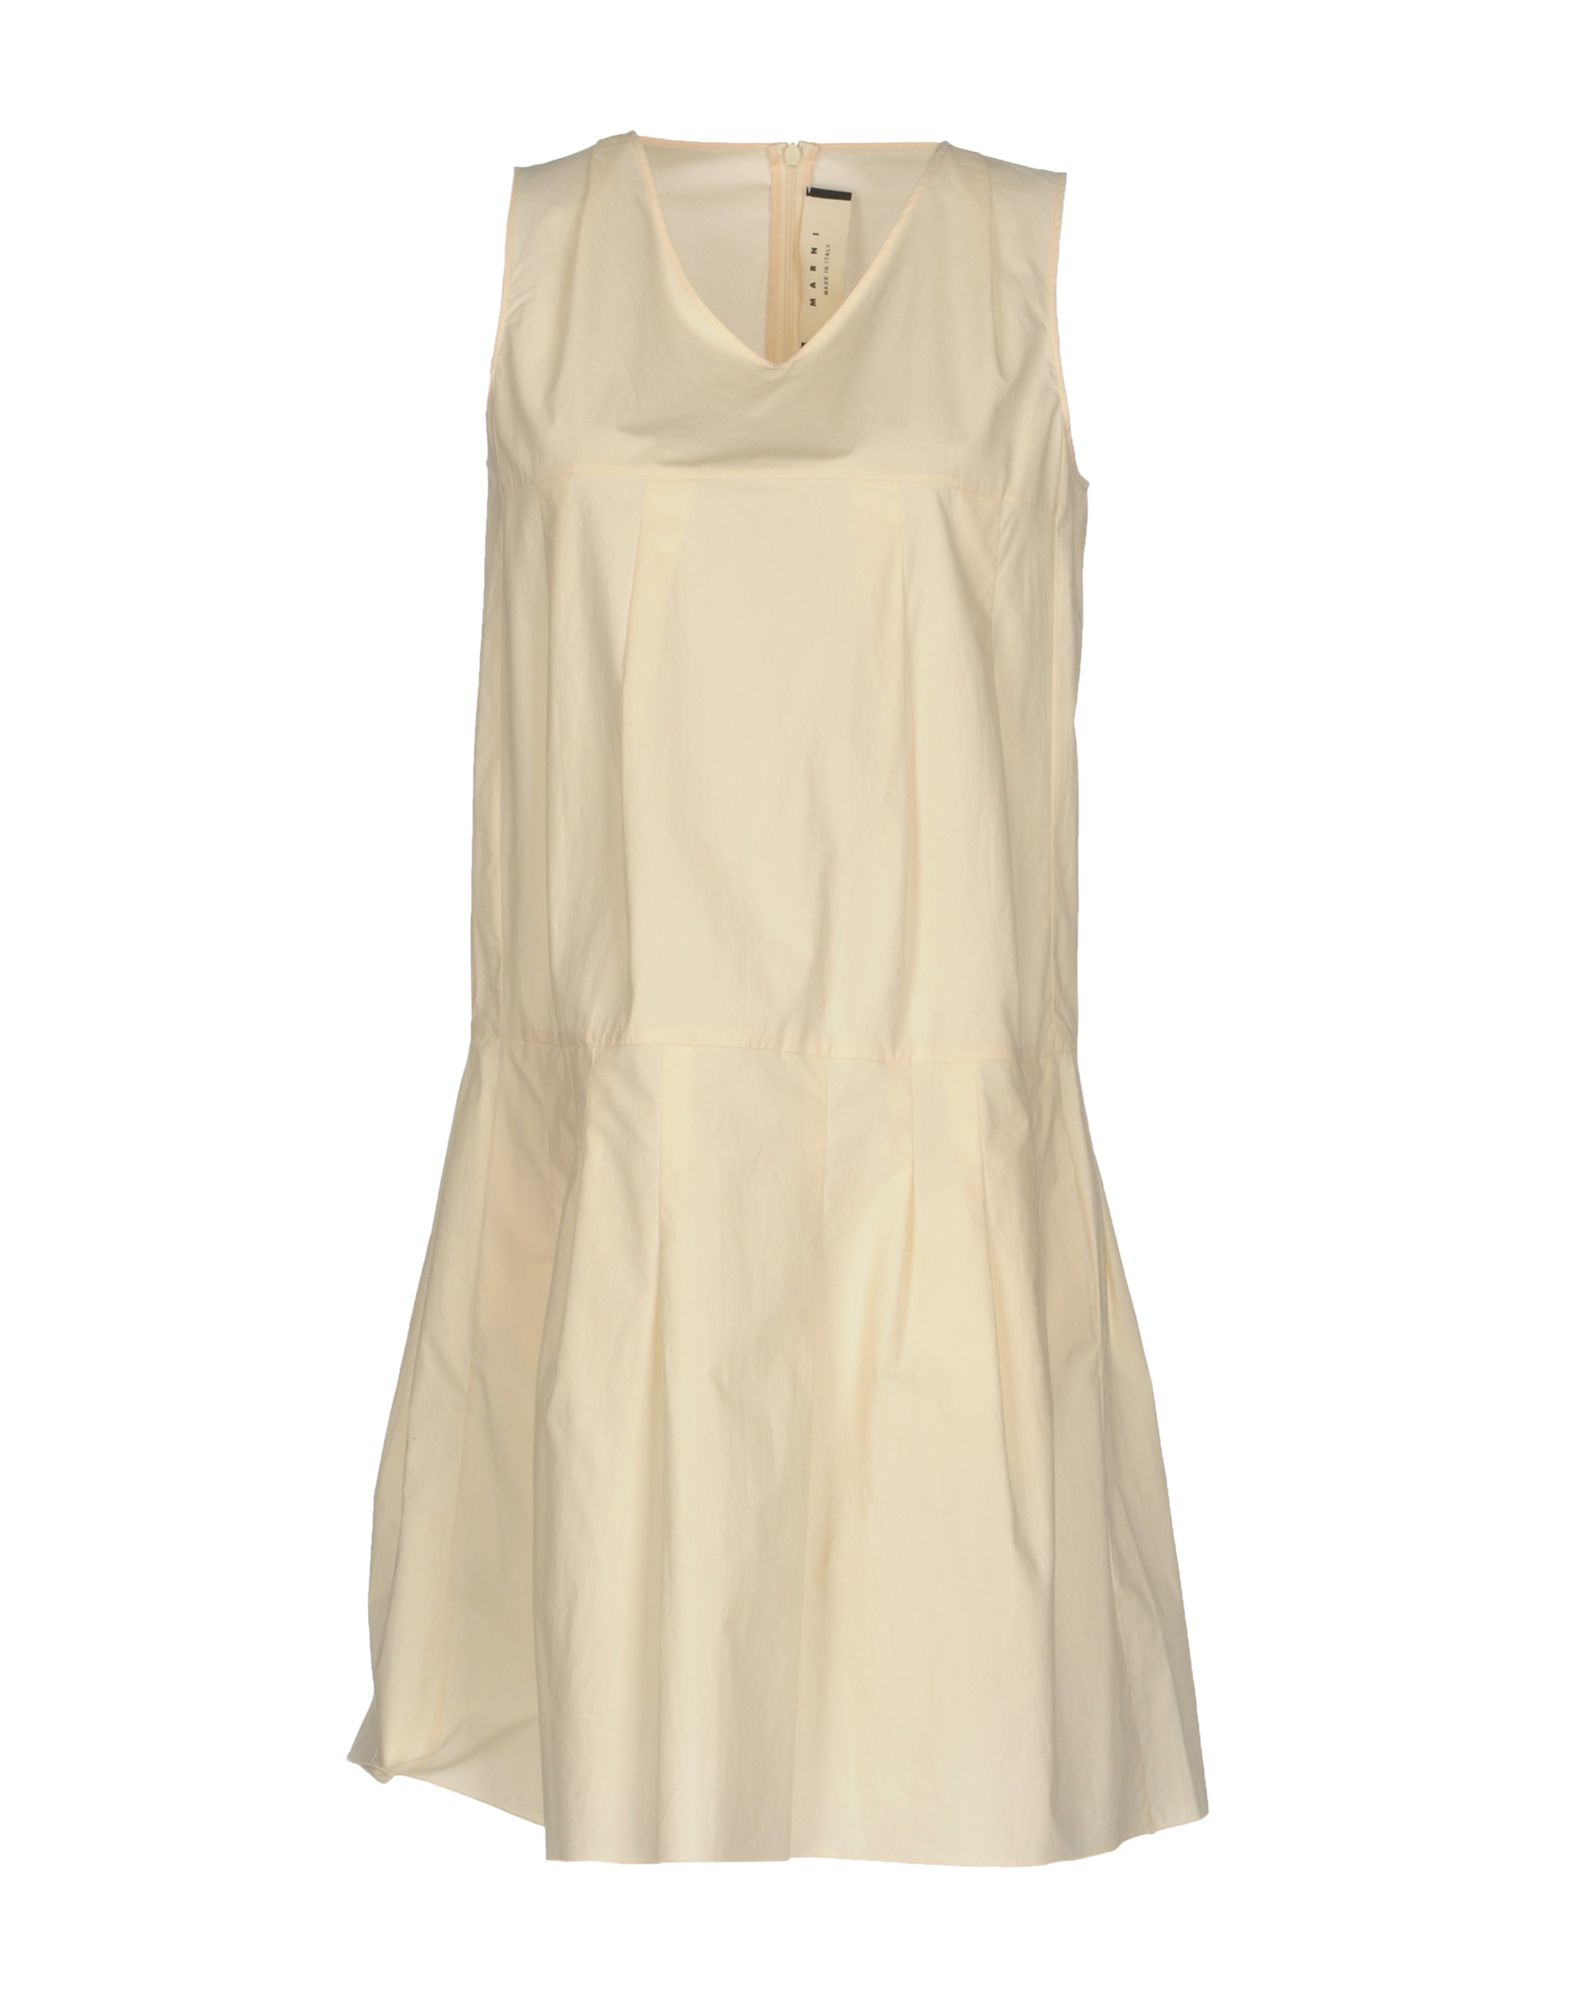 Robe courte marni femme. blanc ivoire. 36...